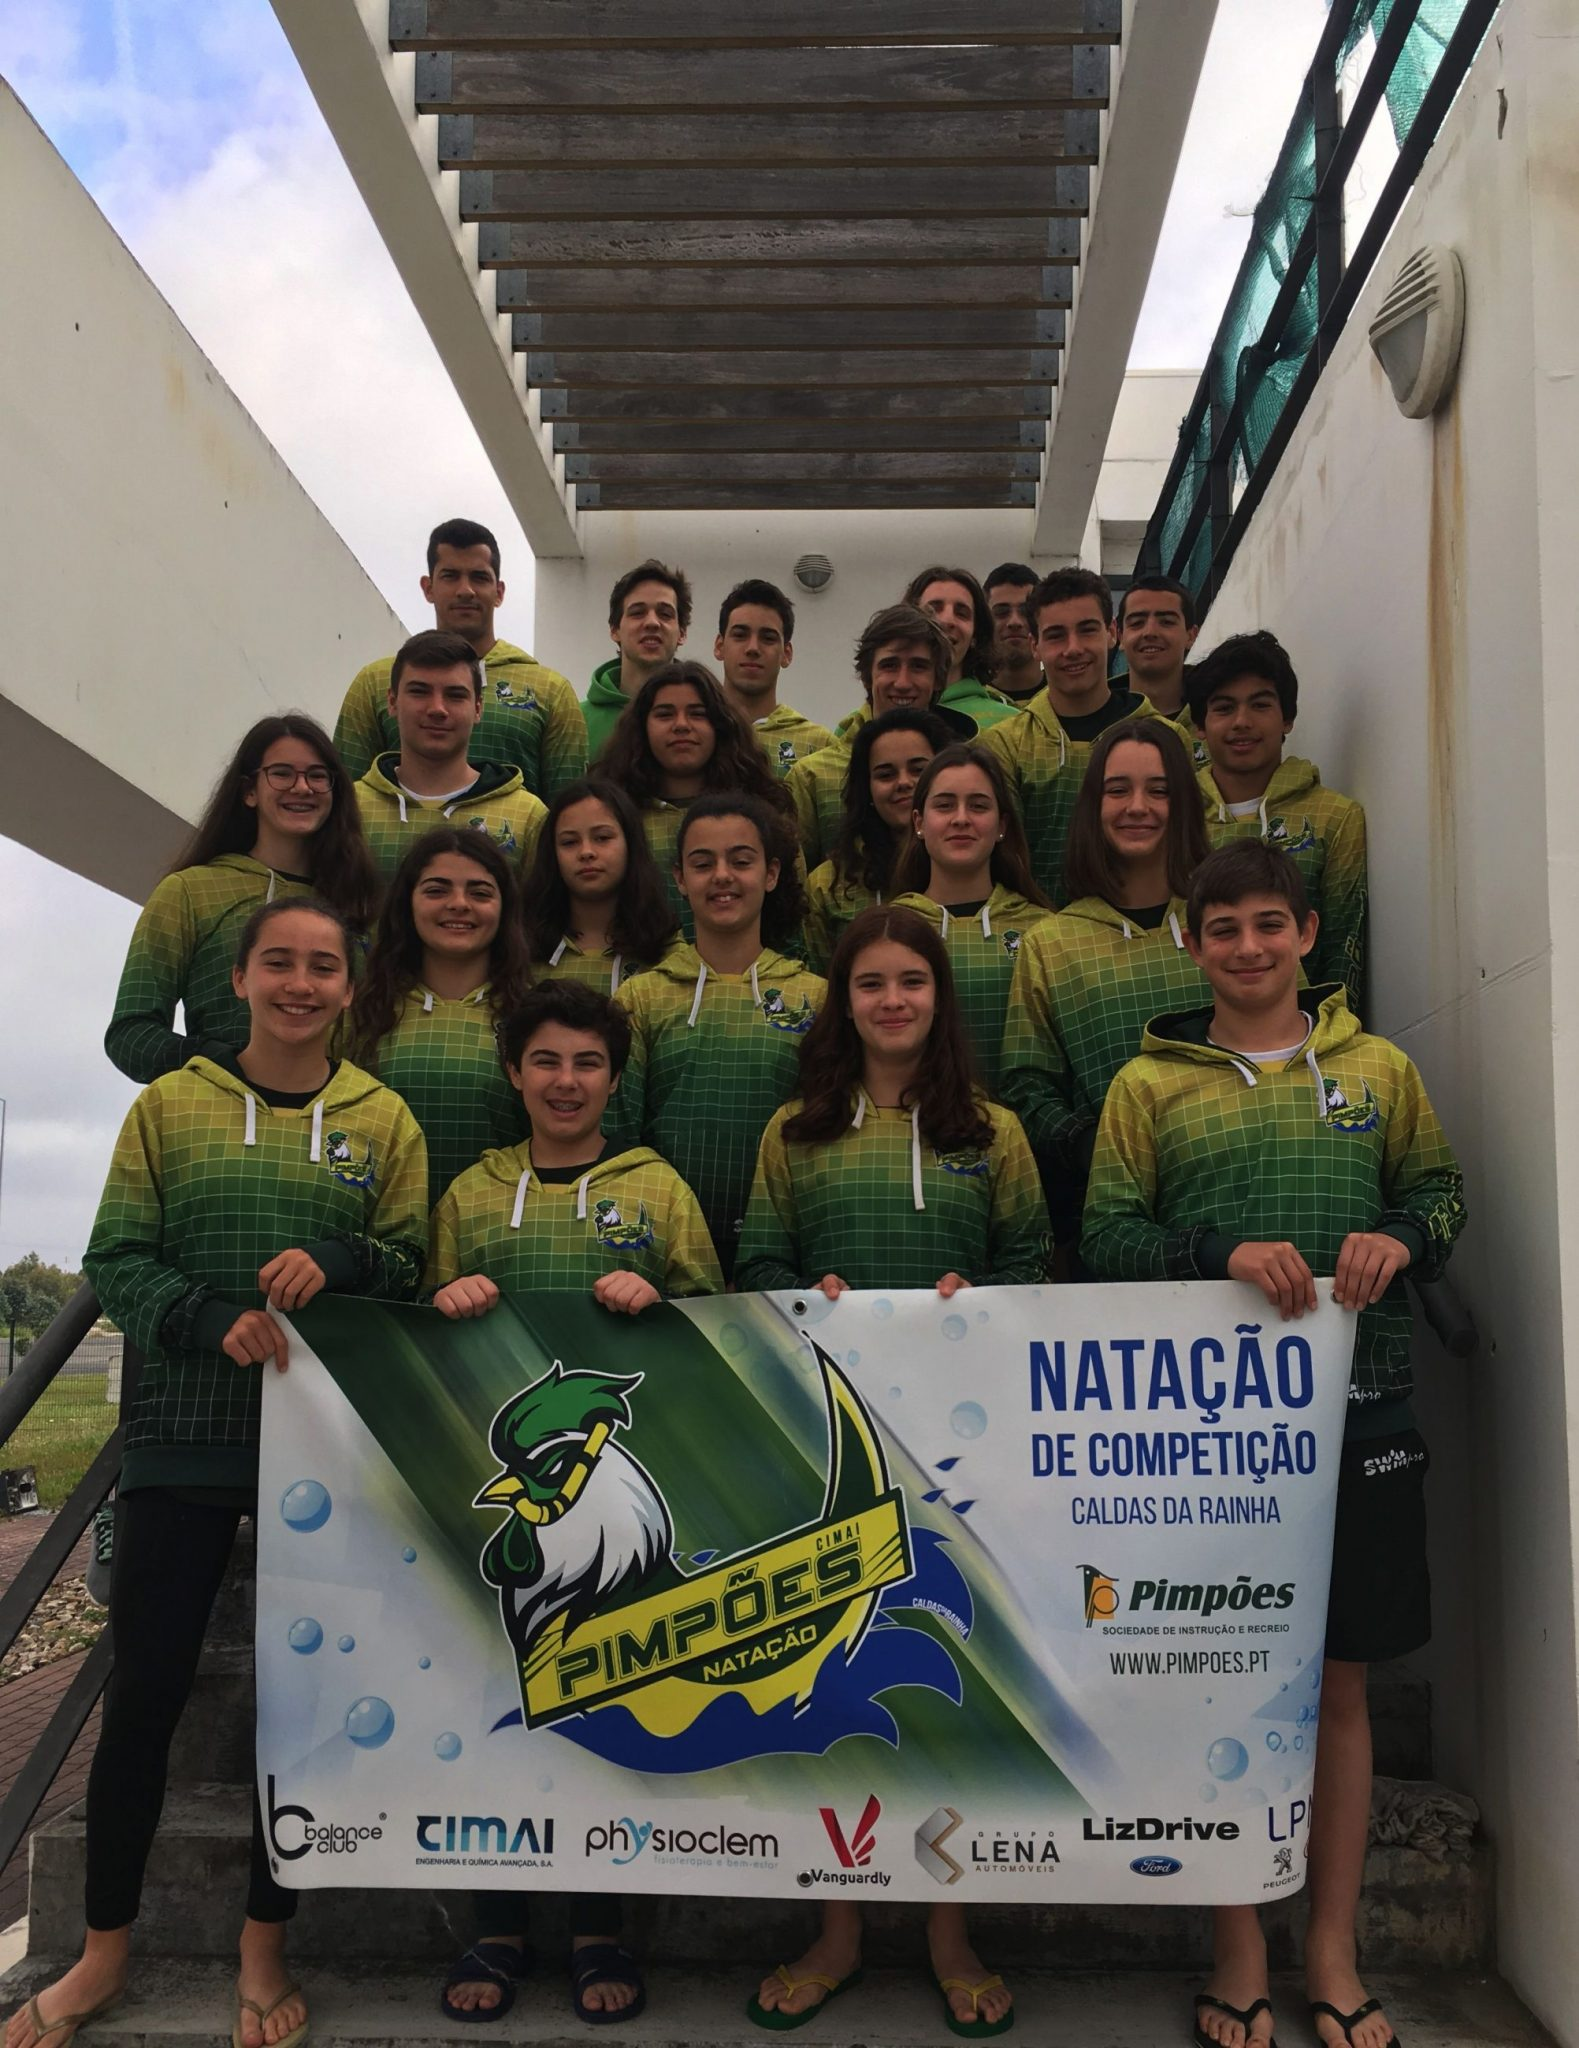 Pimpões/Cimai sagram-se Vice-Campeões Distritais de Clubes